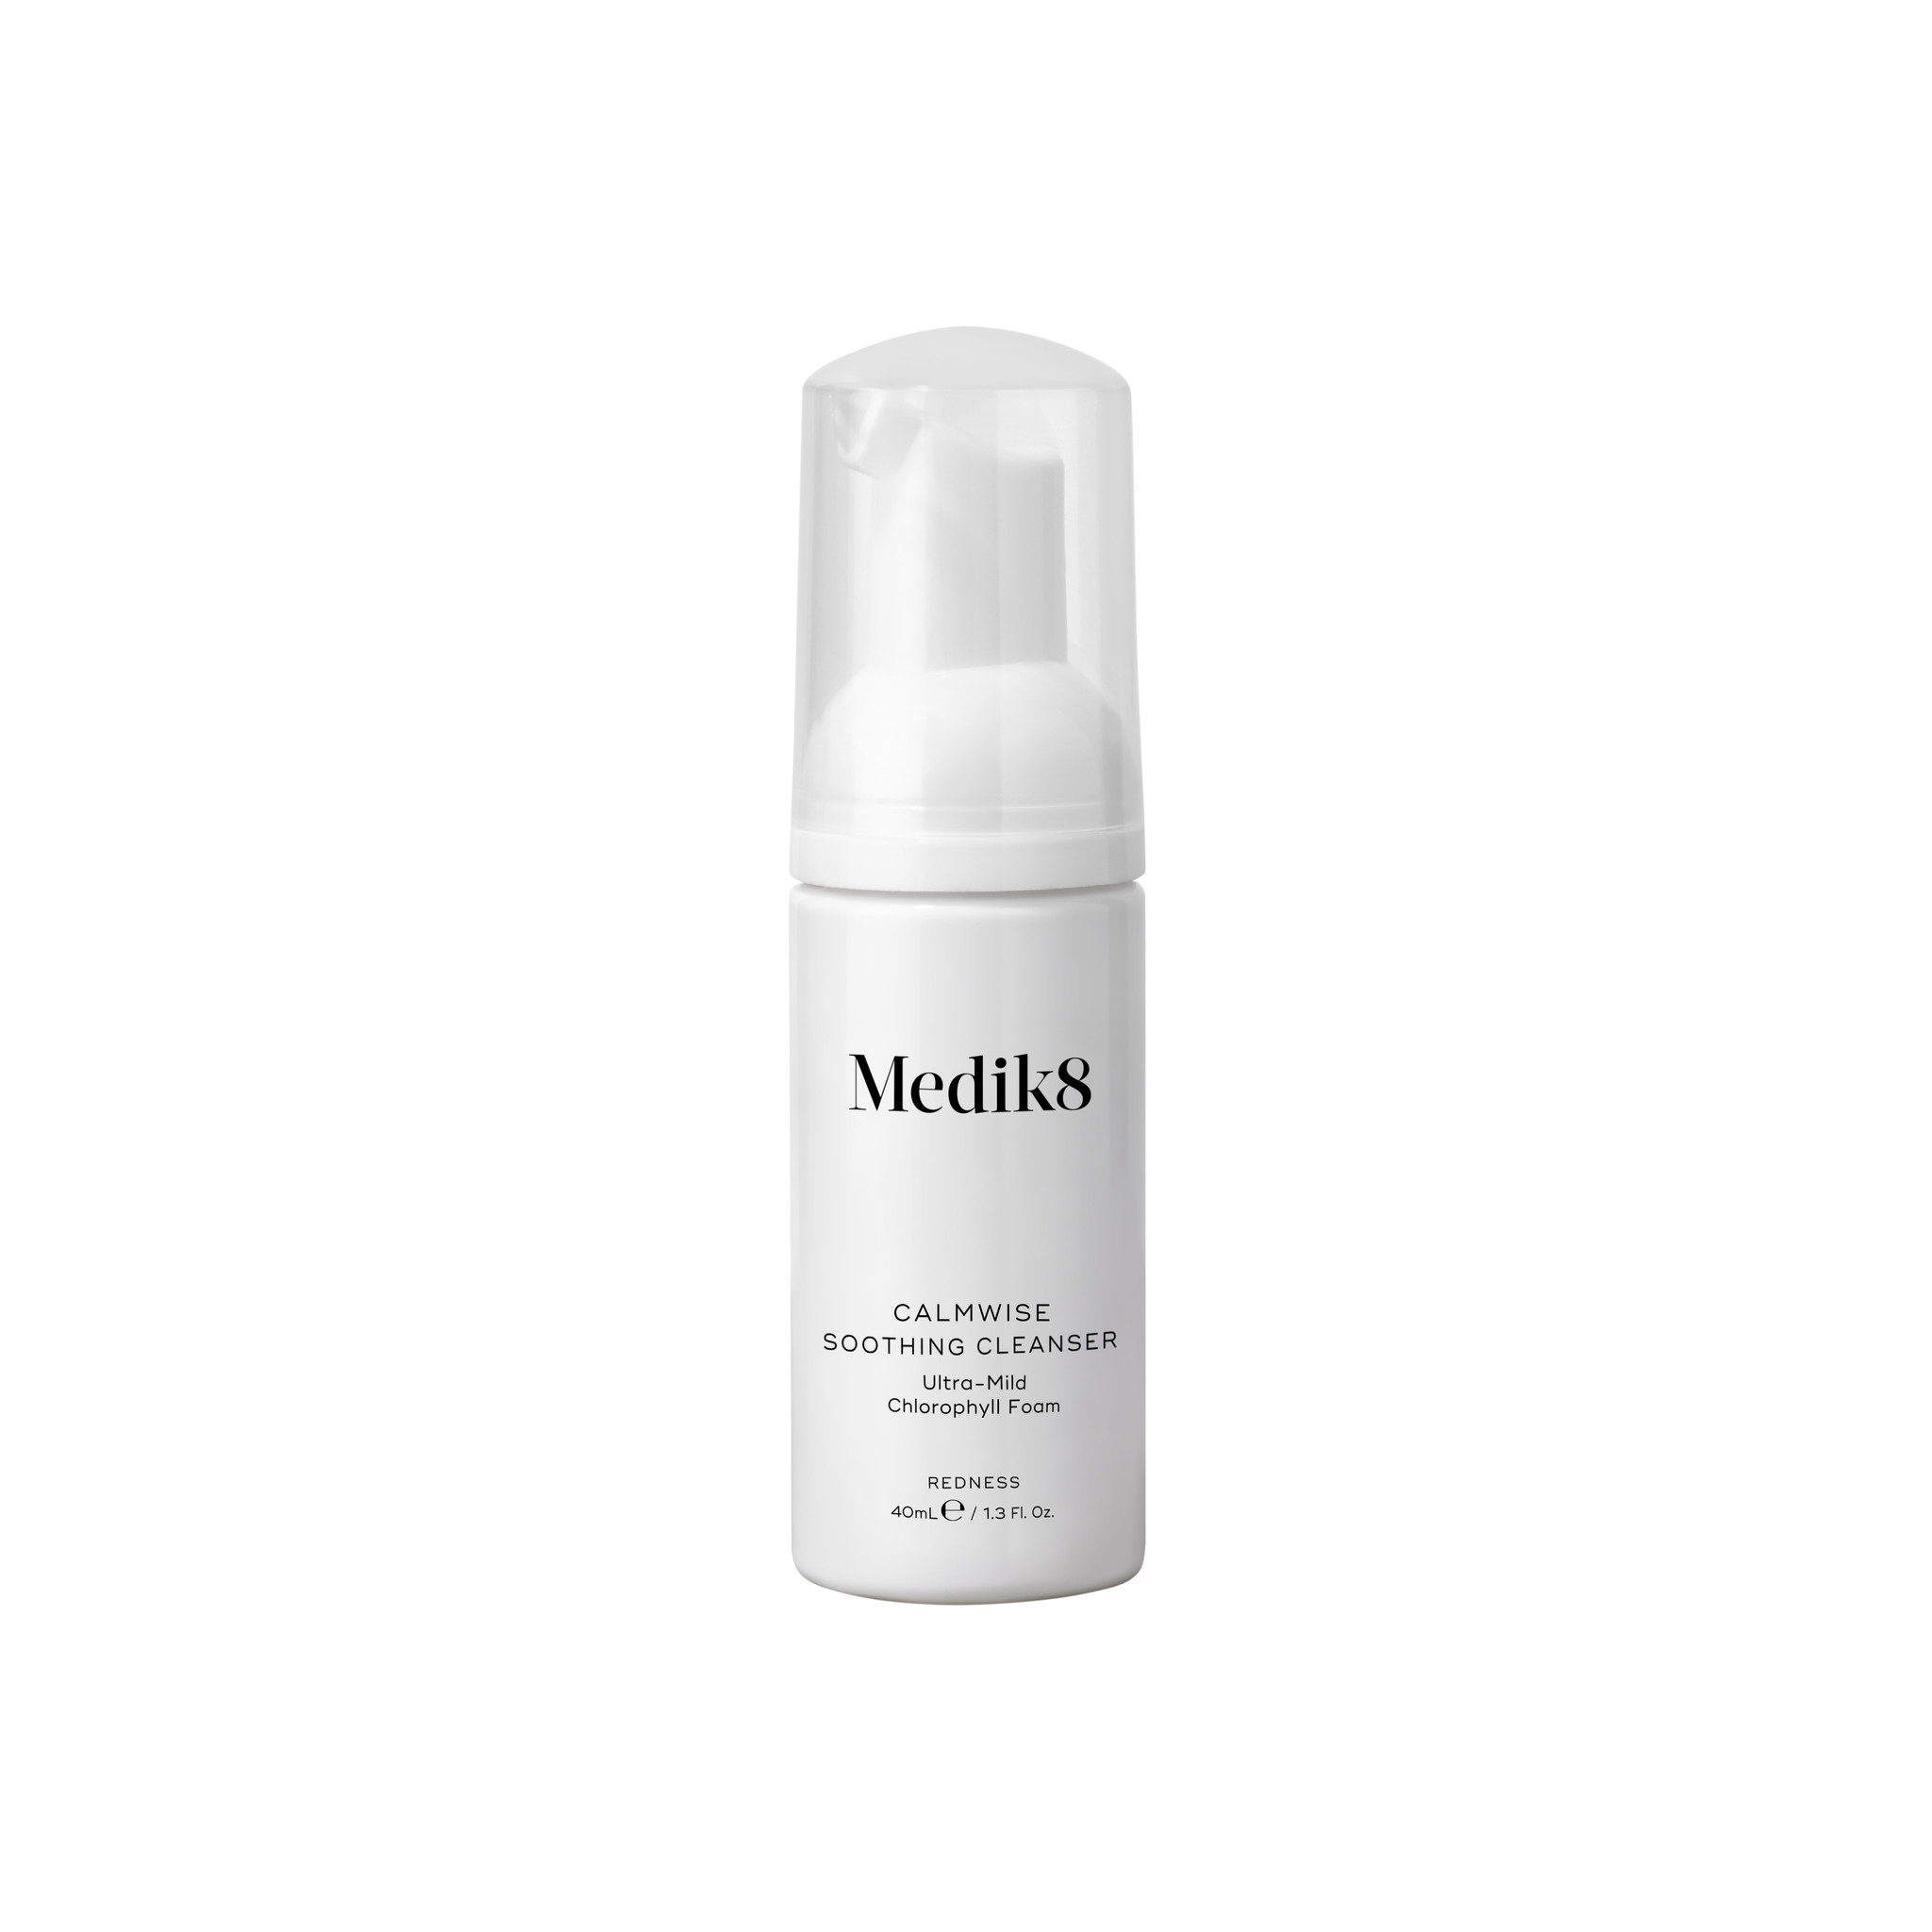 Medik8 Calmwise Colour Correct | Ultra-Mild Chlorophyll Foam | 40ml